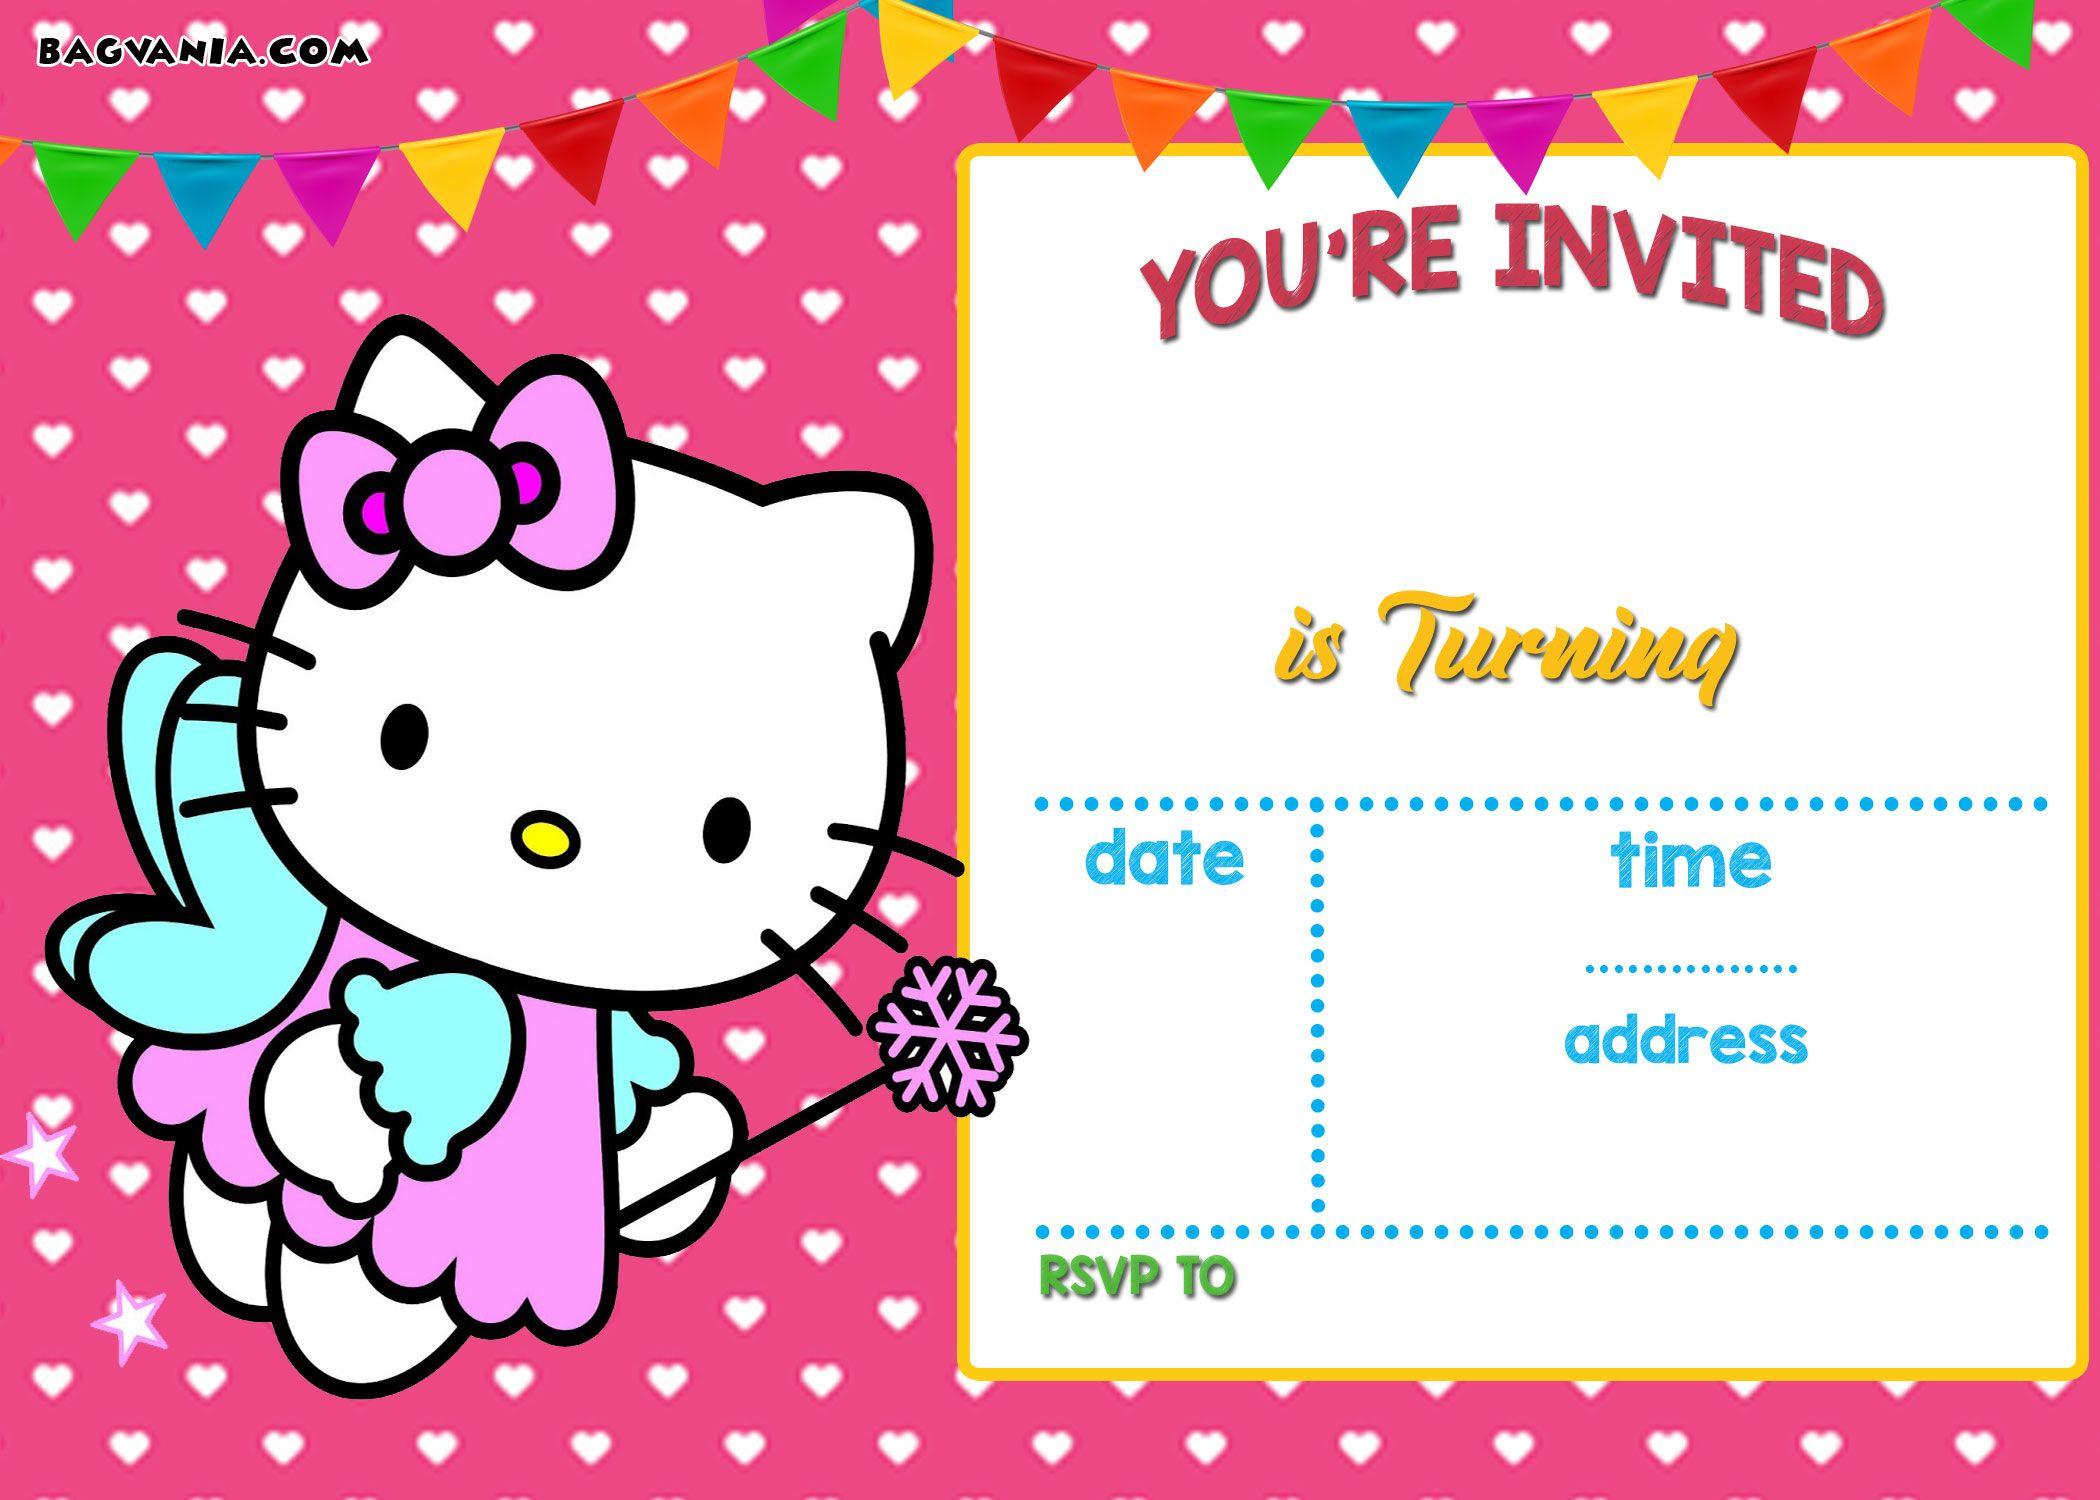 Free Hello Kitty Invitation | Free Printable Birthday Invitation - Hello Kitty Free Printable Invitations For Birthday